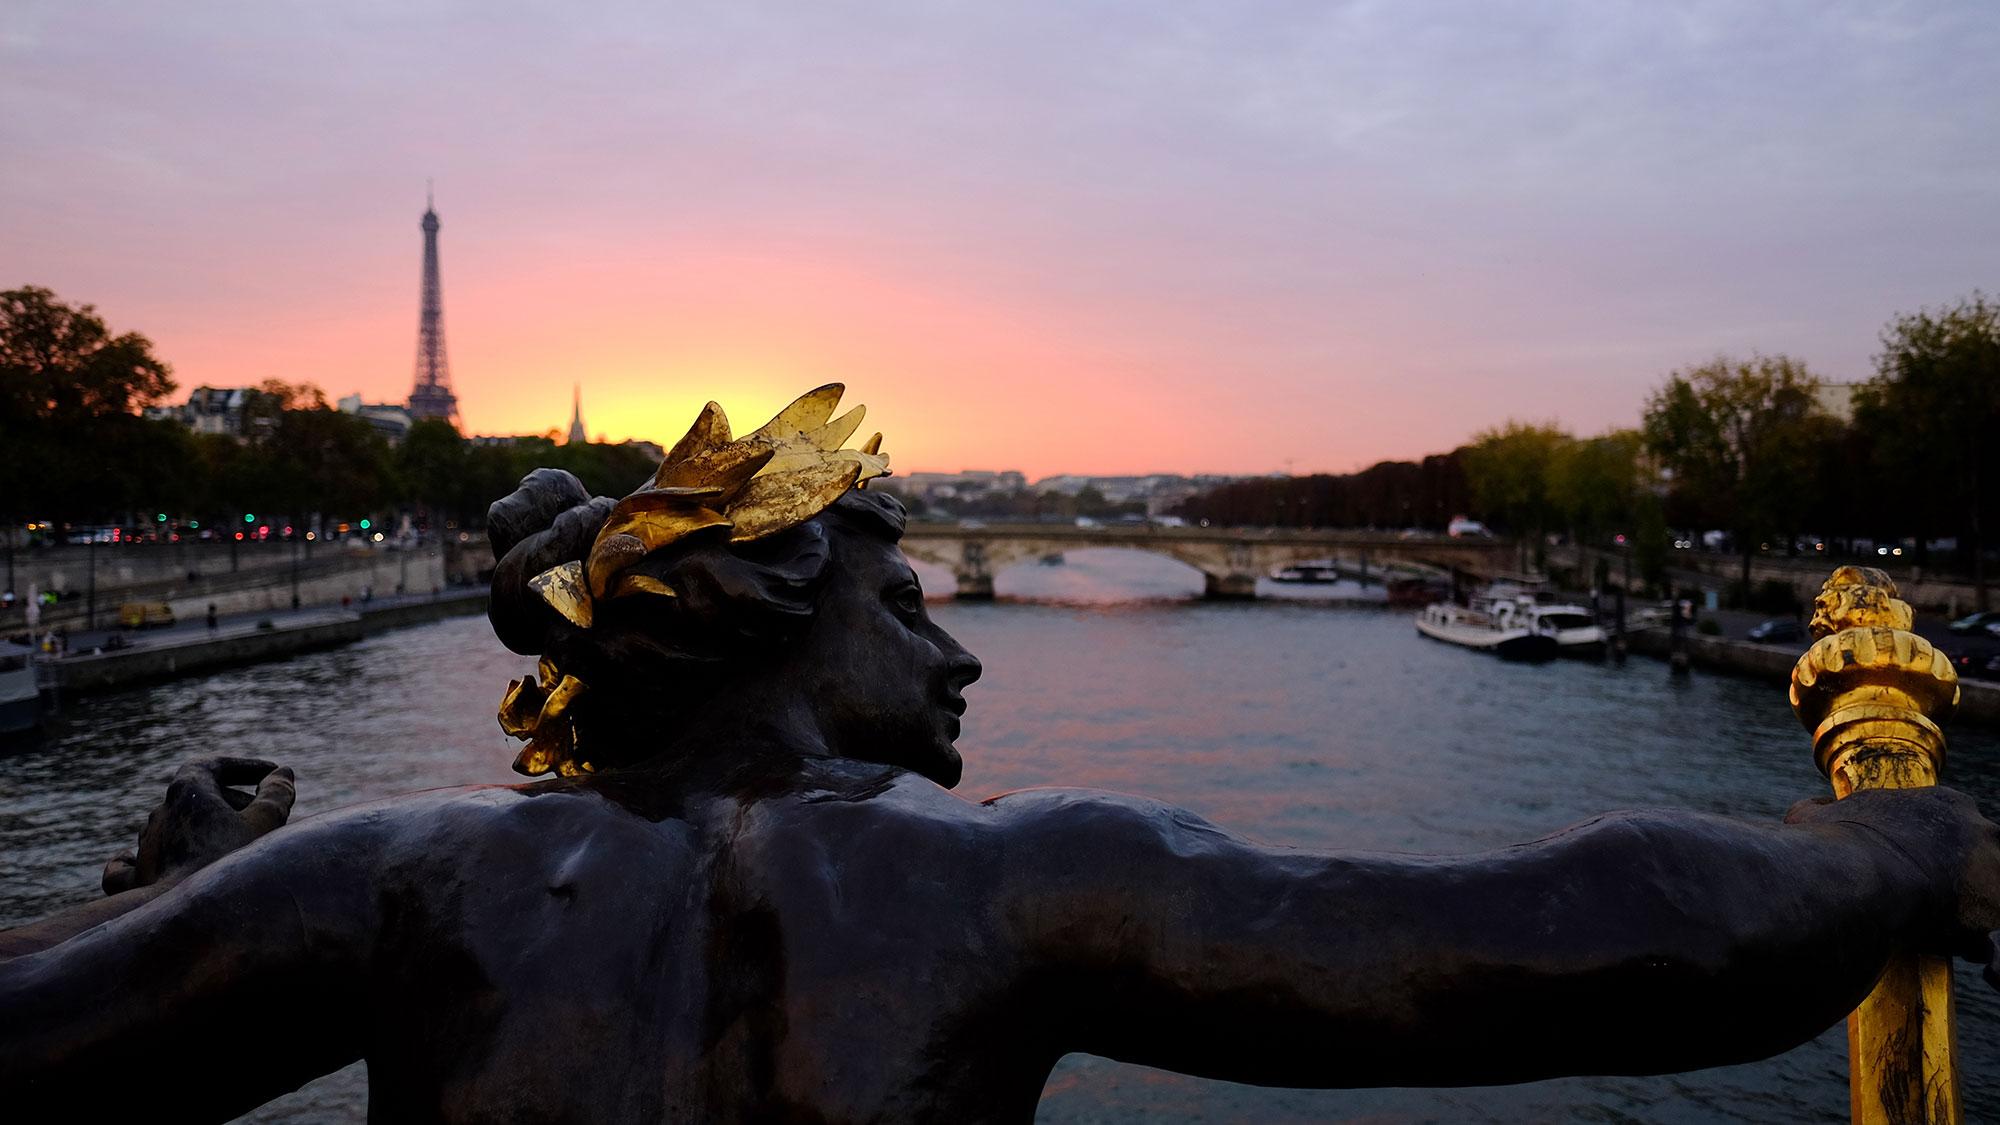 Disney Doing Seine Cruises In 2019 Travel Weekly